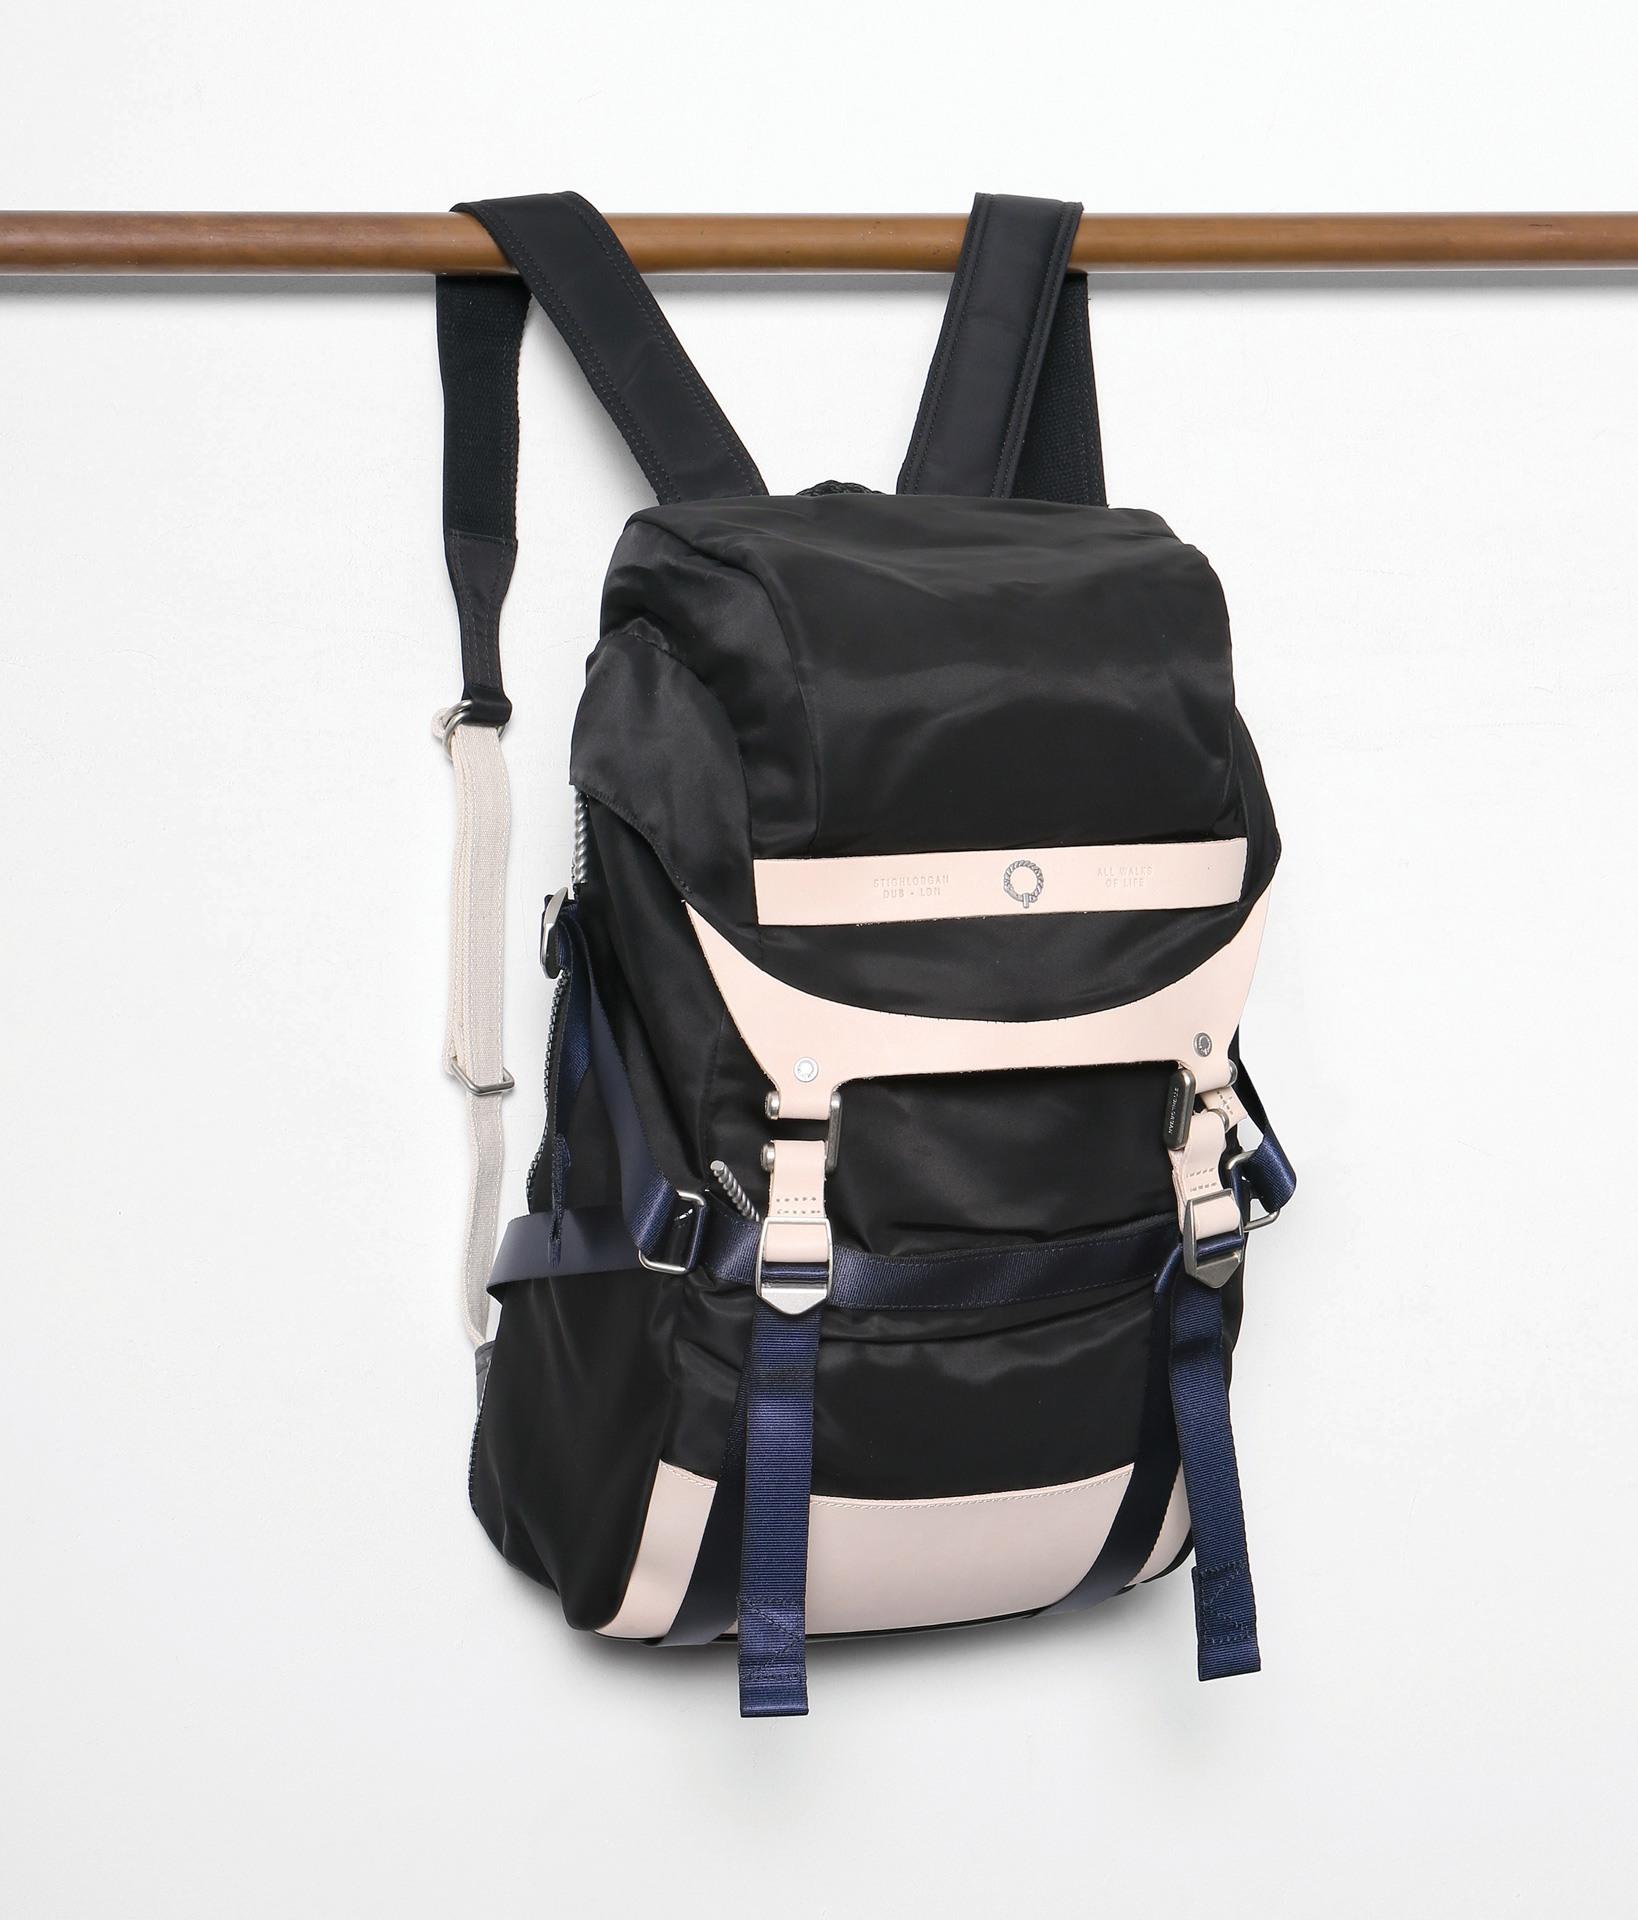 0c854f699507 Stighlorgan - Plato laptop backpack - black